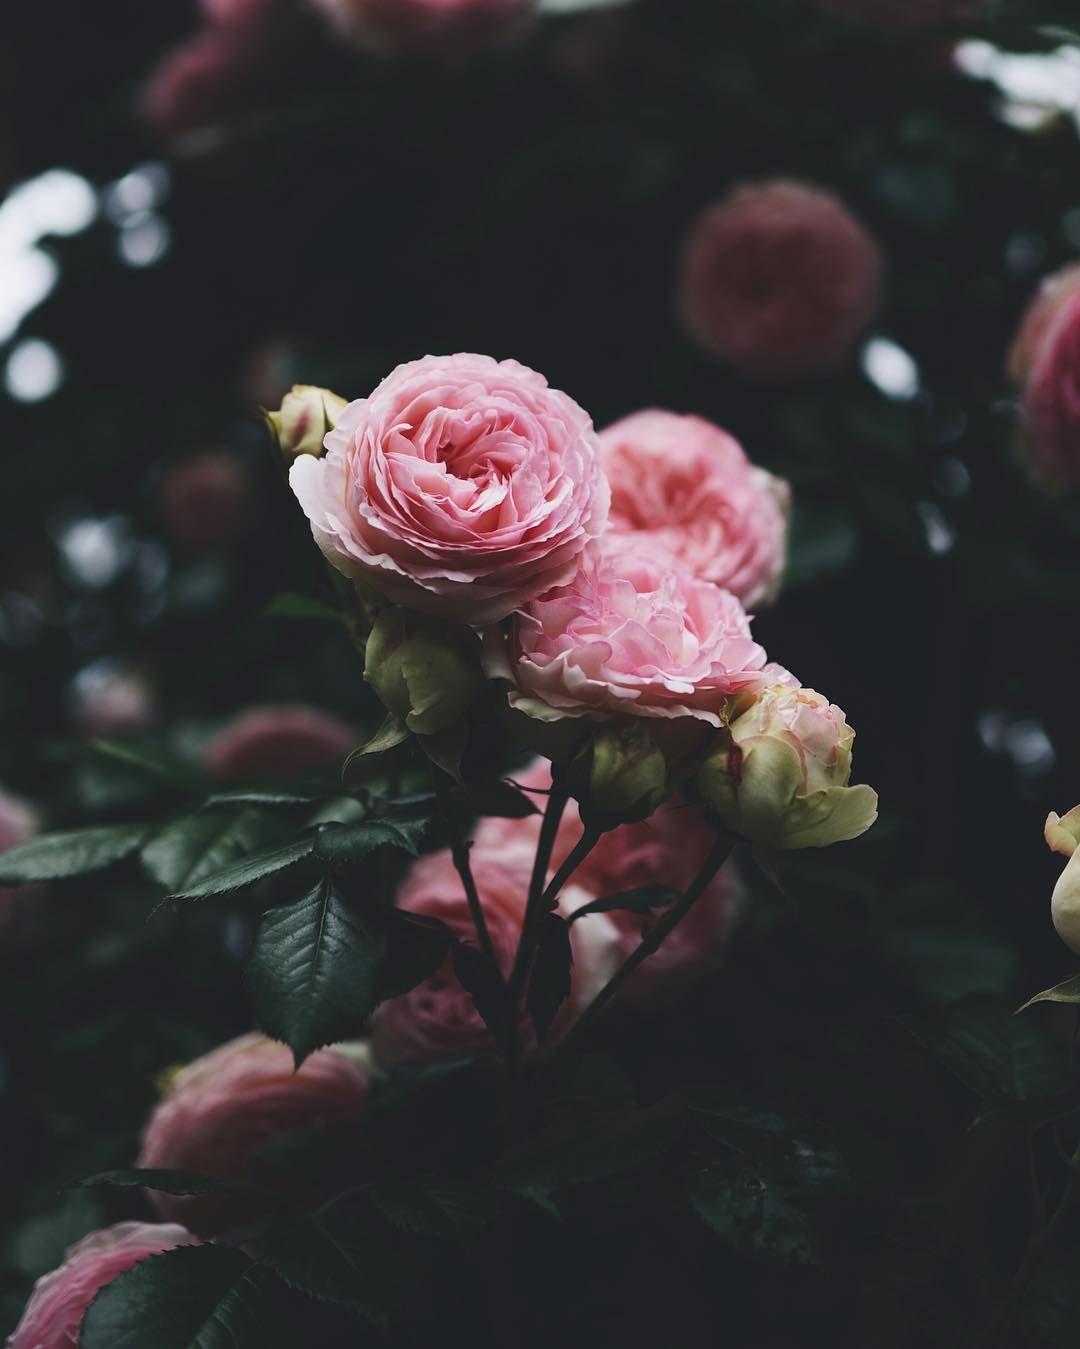 pink roses | Tumblr | Rose tumblr, Rose